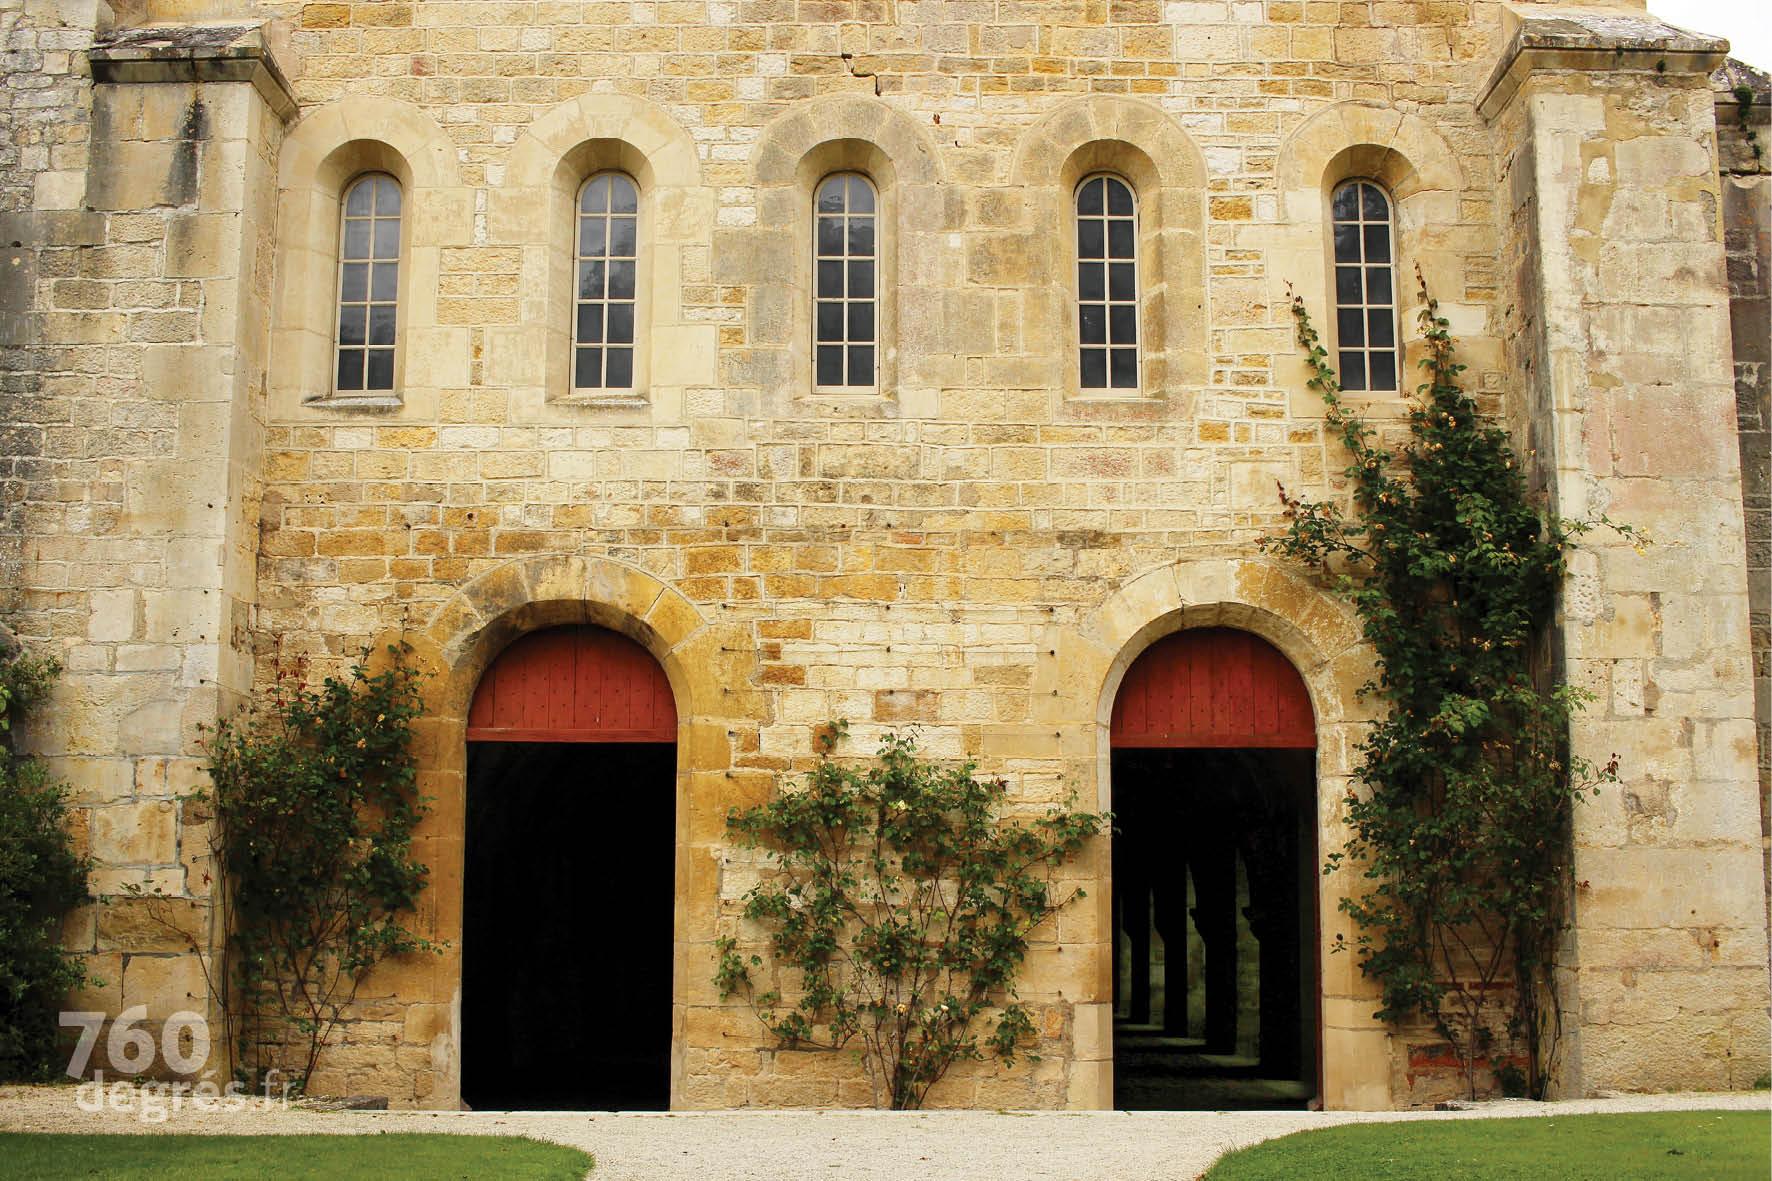 760degres-abbaye-fontenay-13